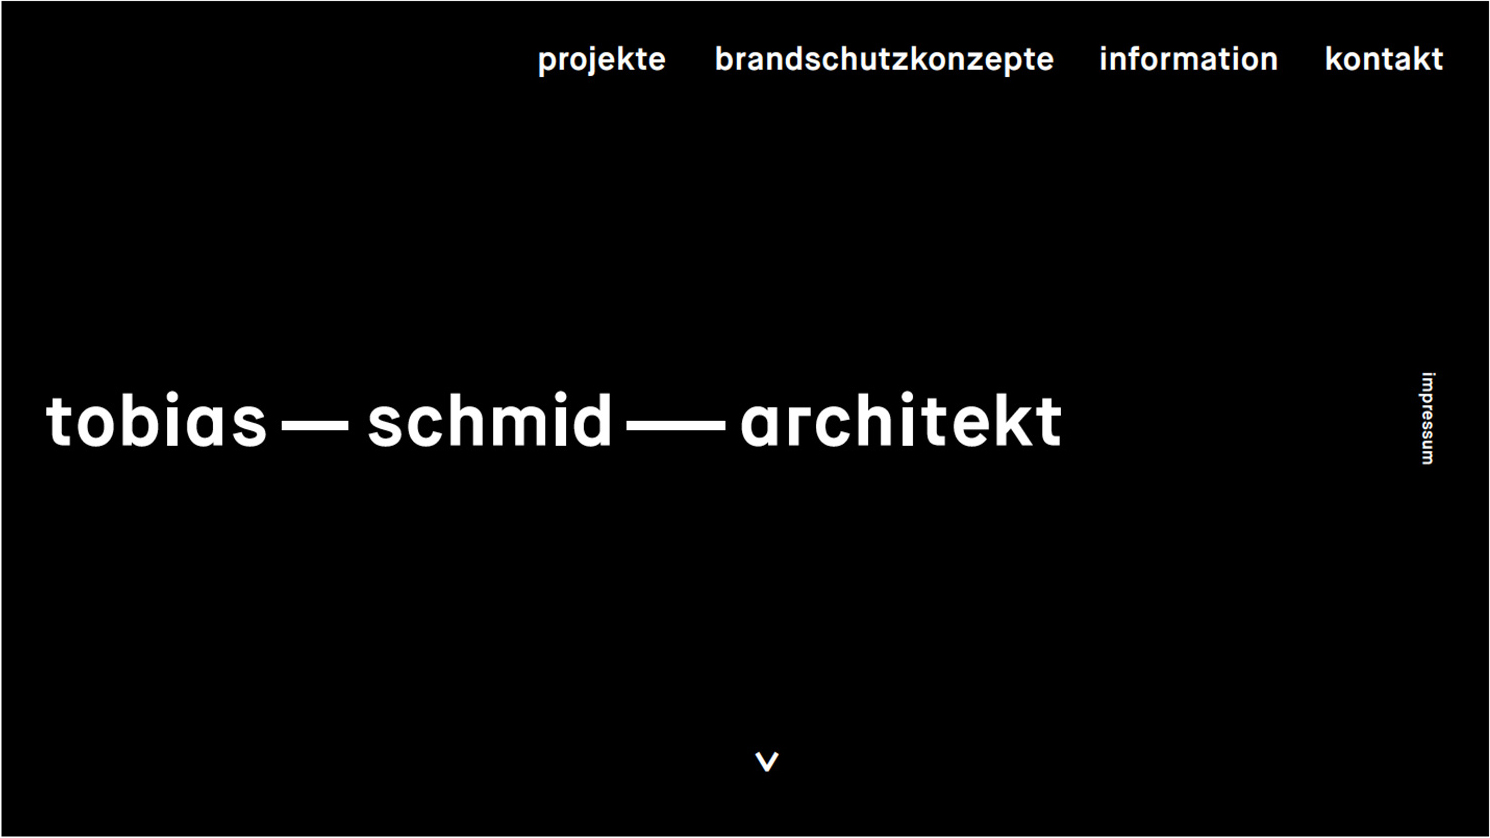 tobias-schmid-architekt, Corporate Identity